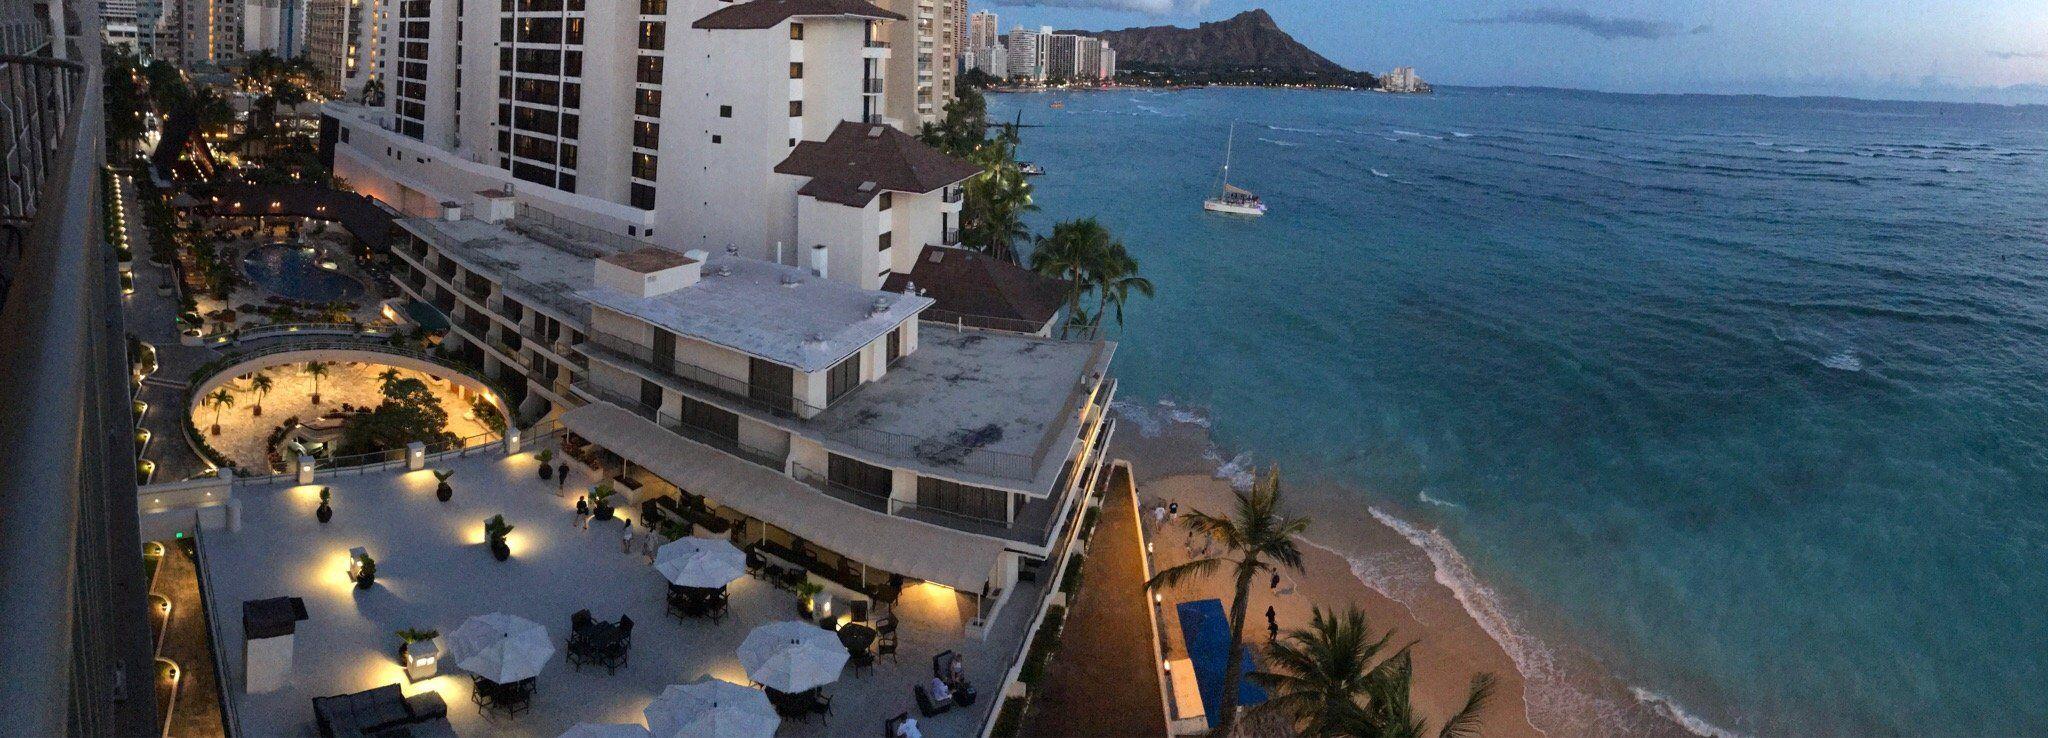 Outrigger Reef Waikiki Beach Resort Now 205 Was 2 8 5